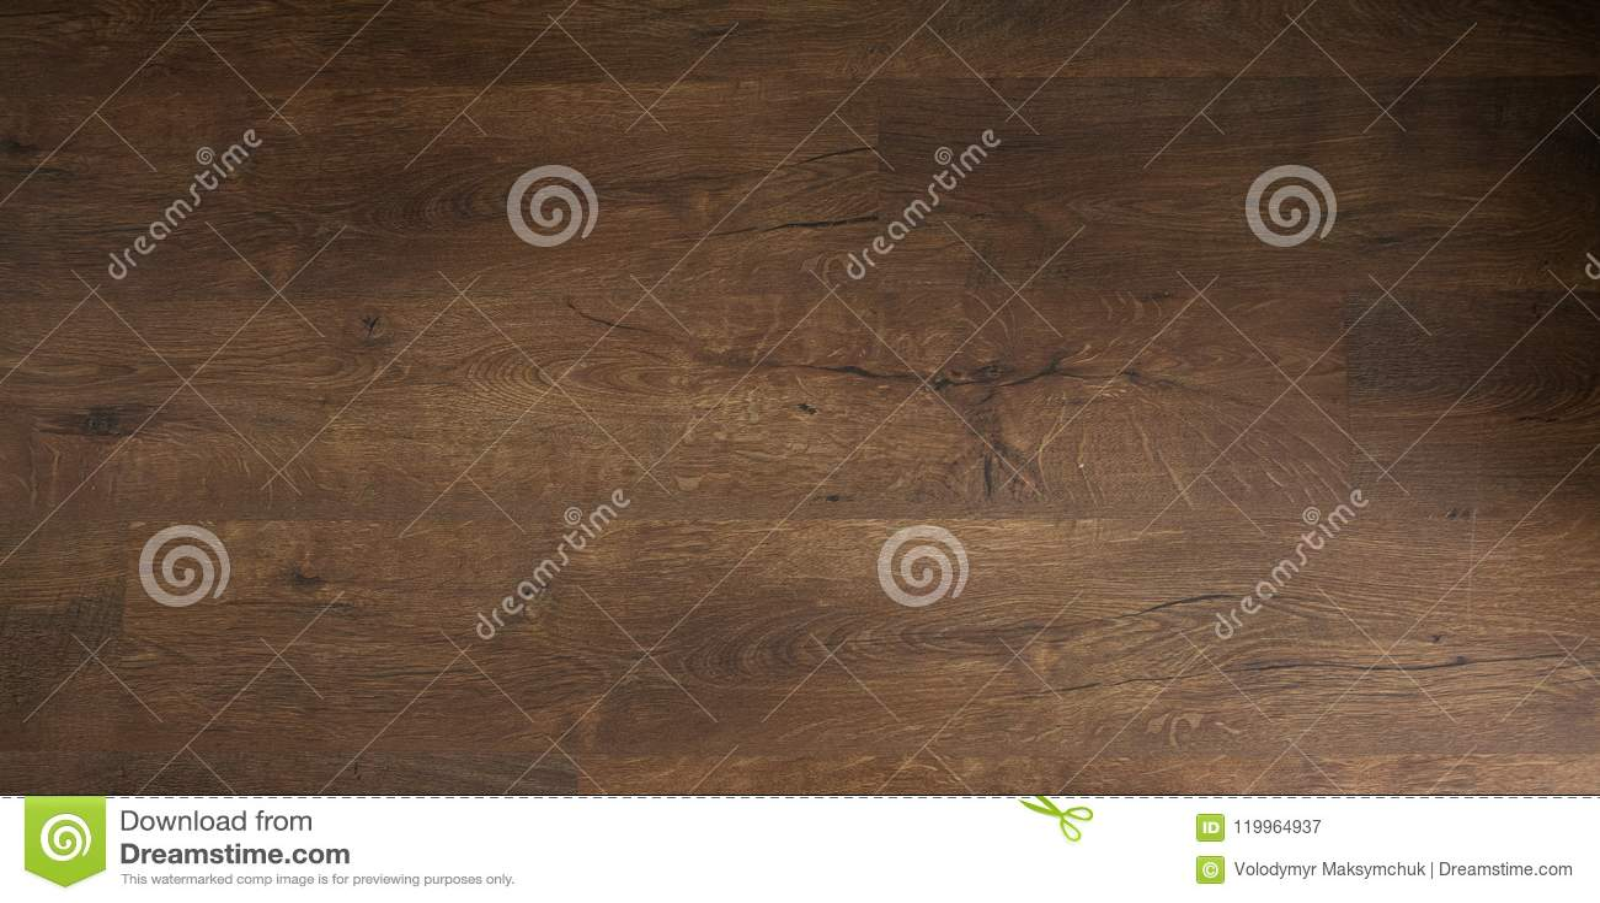 Темный пол дуба Деревянный пол, партер дуба - деревянный настил, ламинат дуба